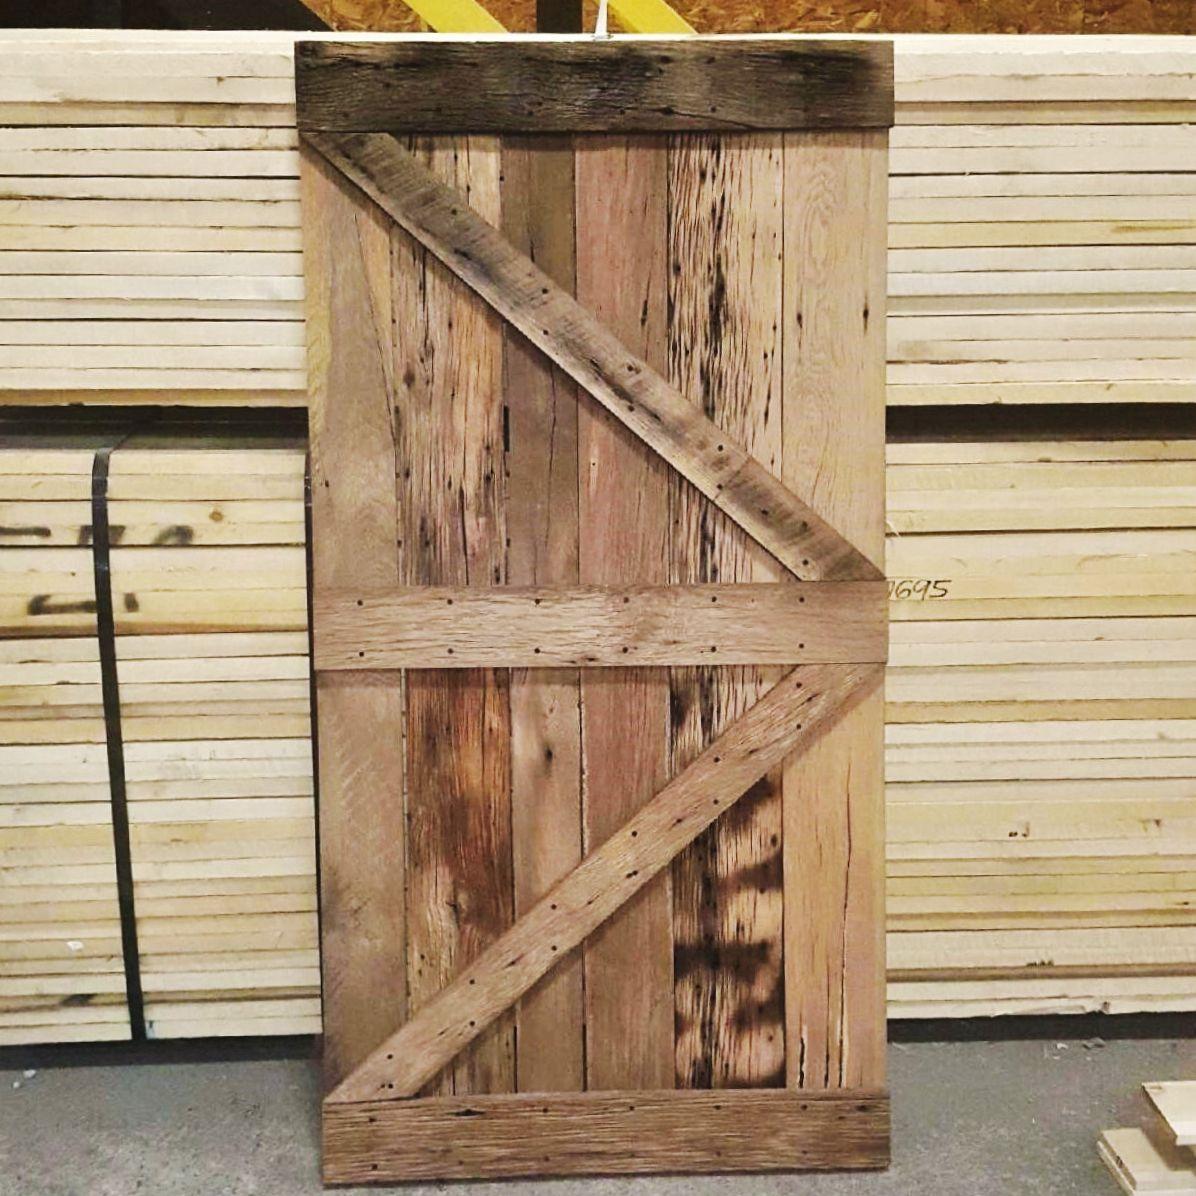 Reclaimed Wood Barn Door Made By 84 Lumber Custom Millworkshops Barn Door Wood Barn Door Interior Sliding Barn Doors